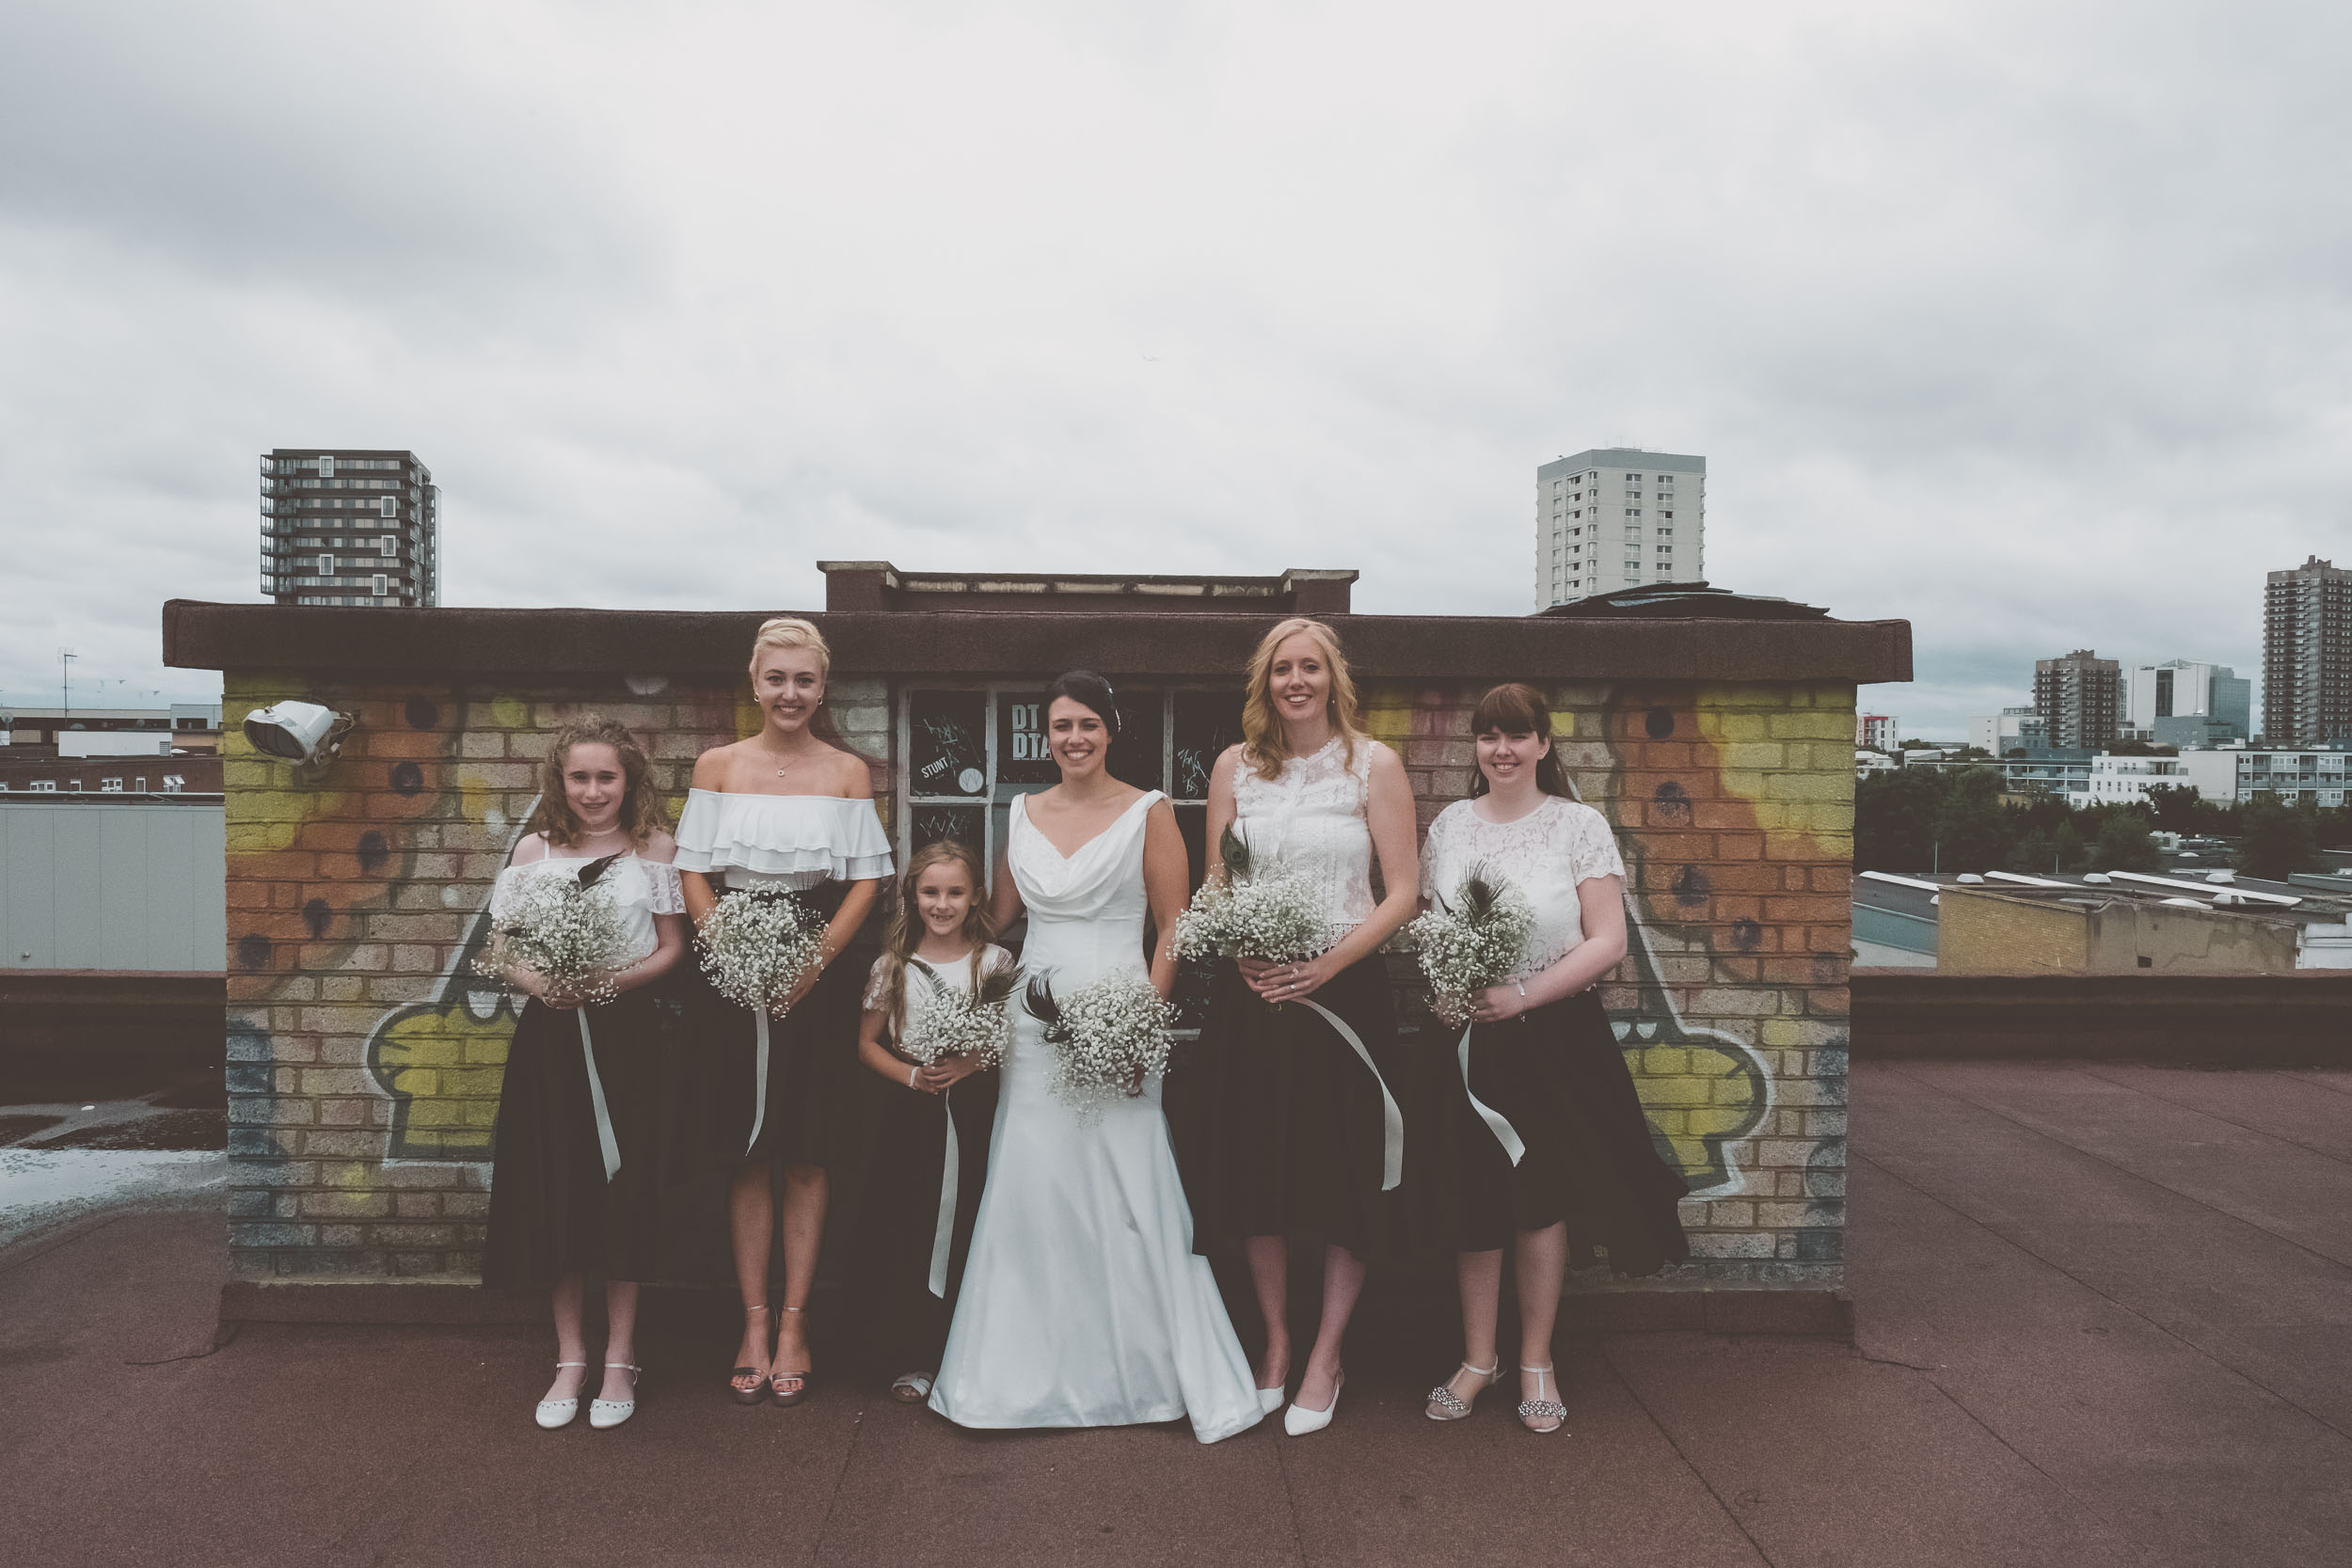 islington-town-hall-4th-floor-studios-wedding262.jpg